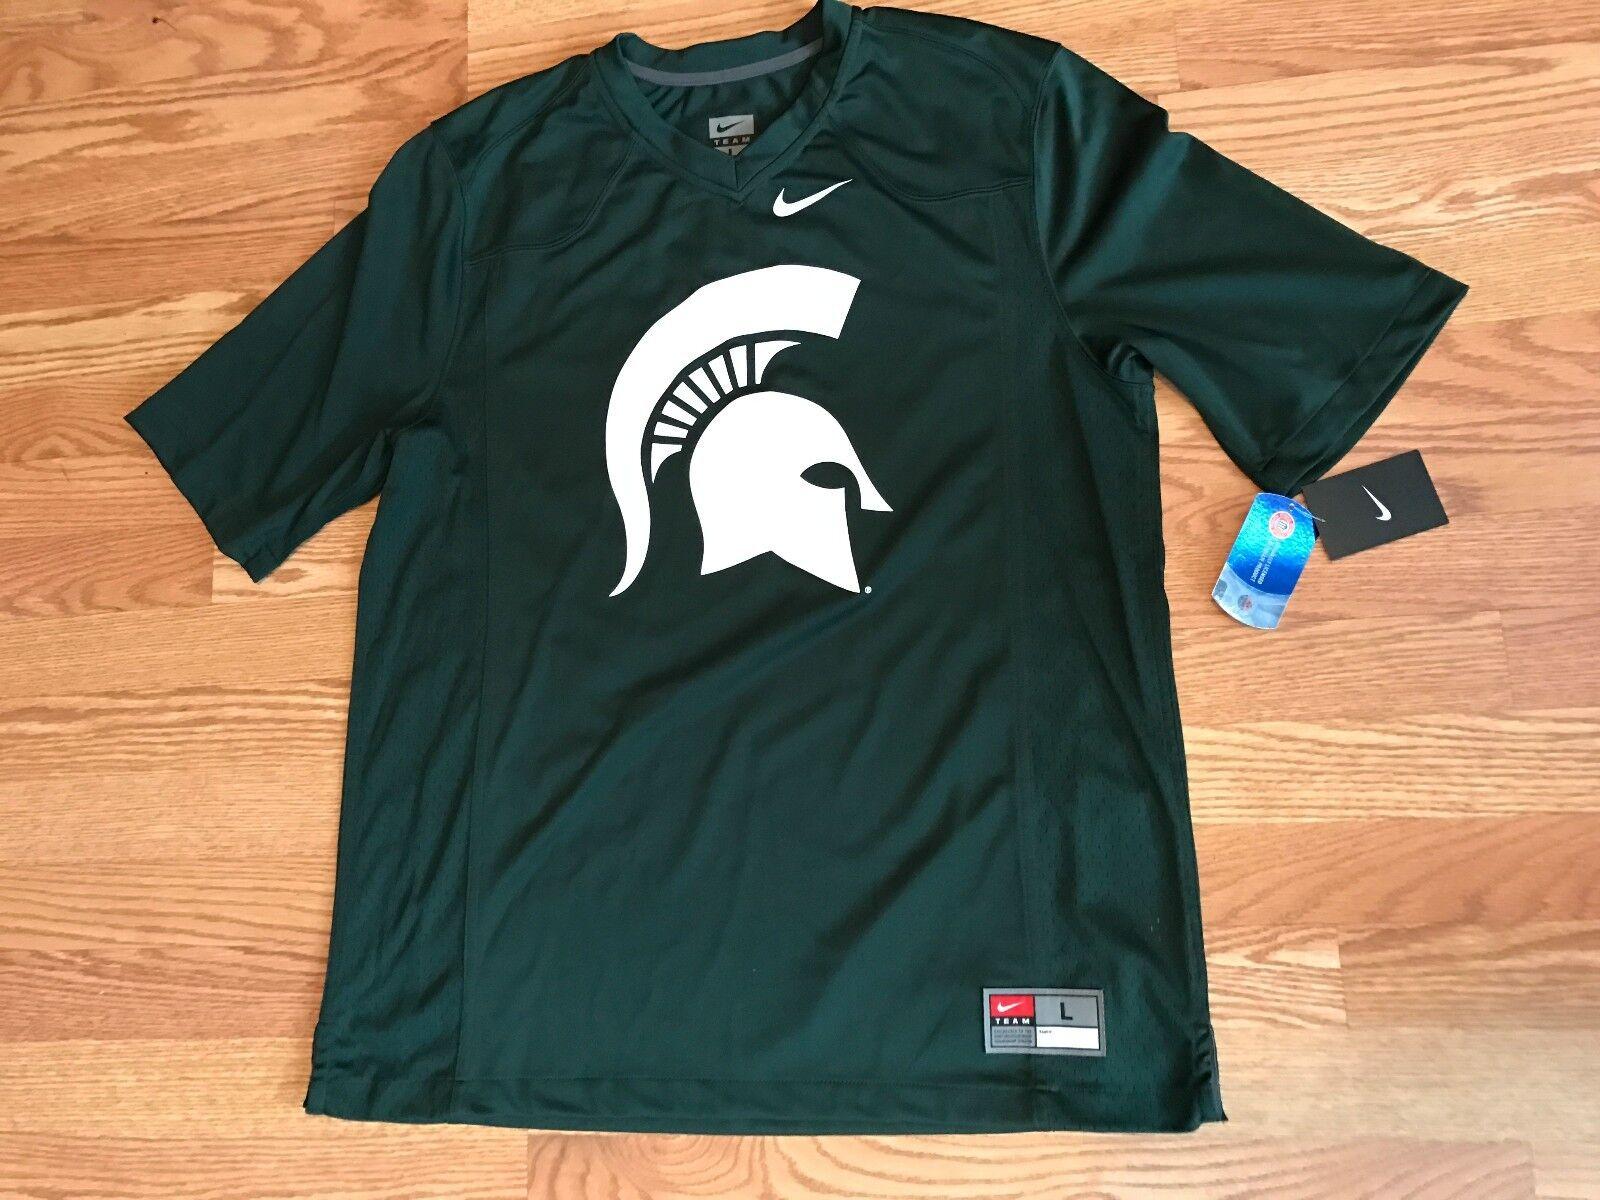 Nike Green White MSU Michigan State Spartans Football Jersey Spartan